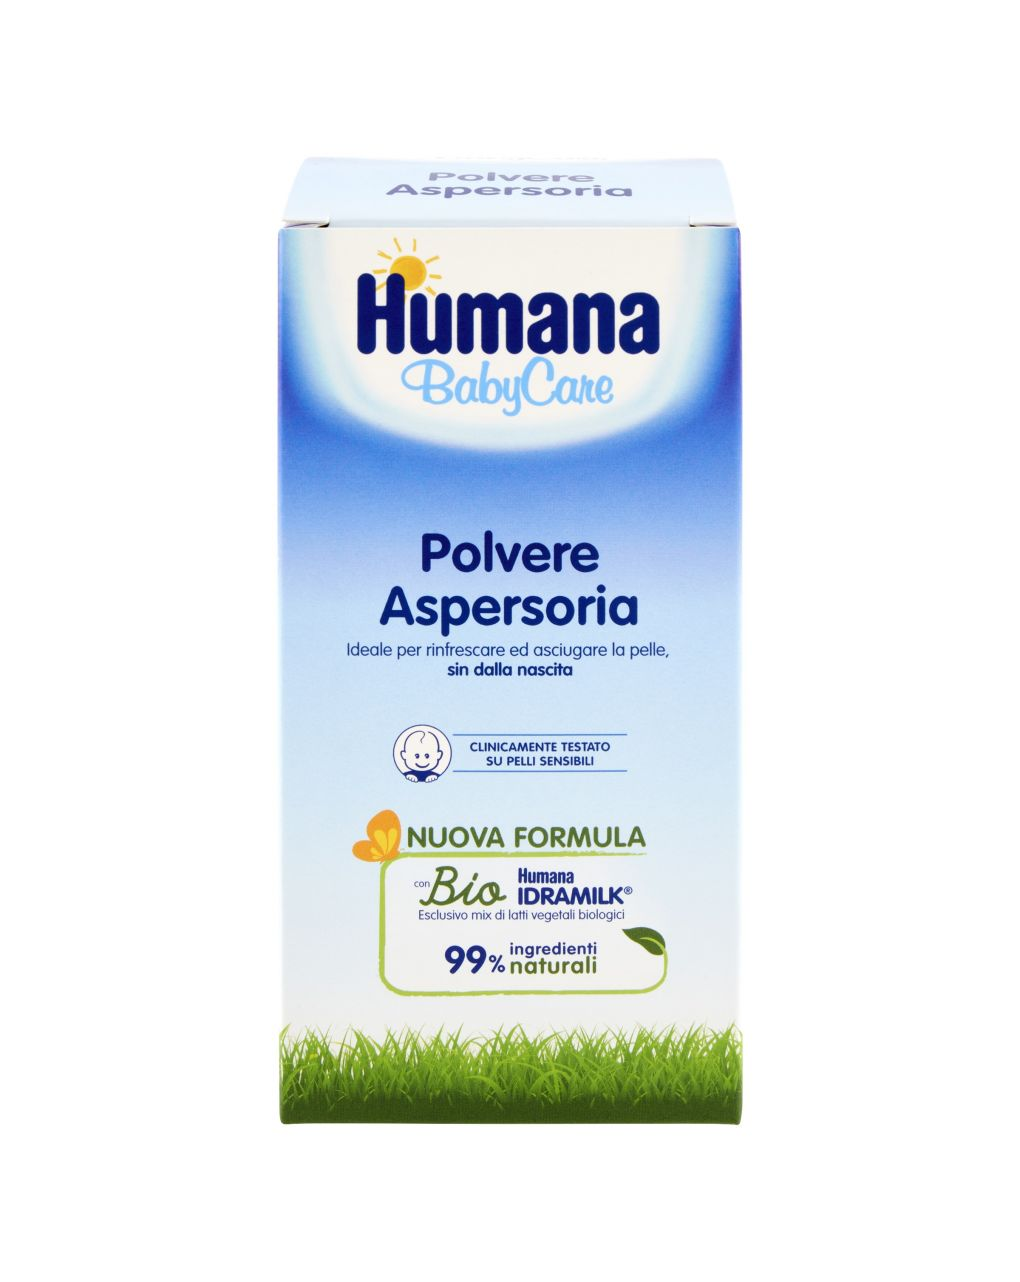 Polvere aspersoria 150gr - Humana